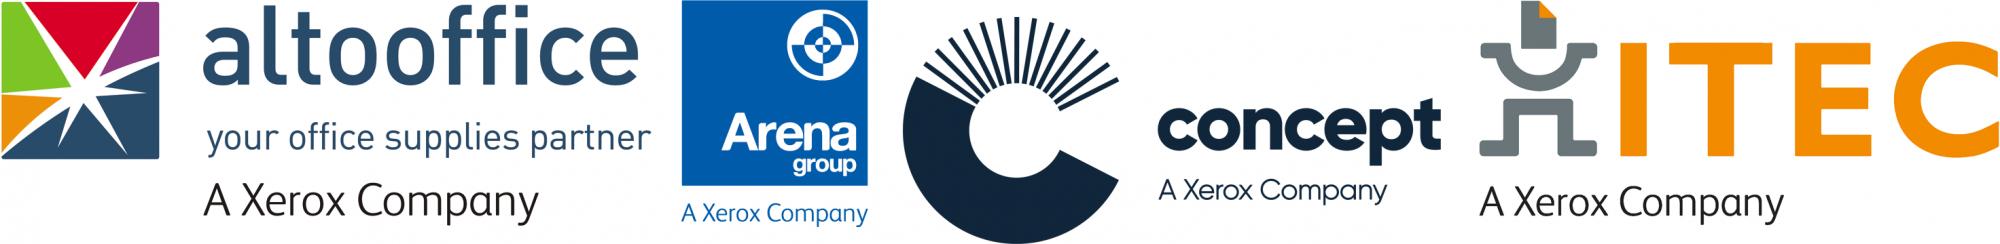 Altooffice, Arena, Concept & ITEC - Xerox Companies